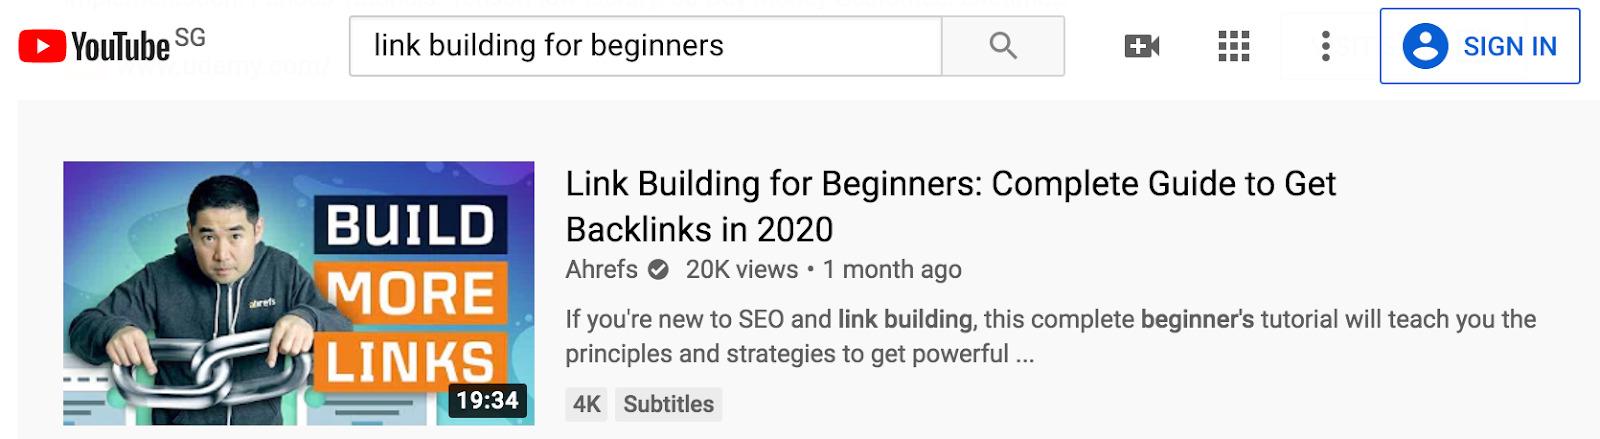 youtube link building ahrefs 1